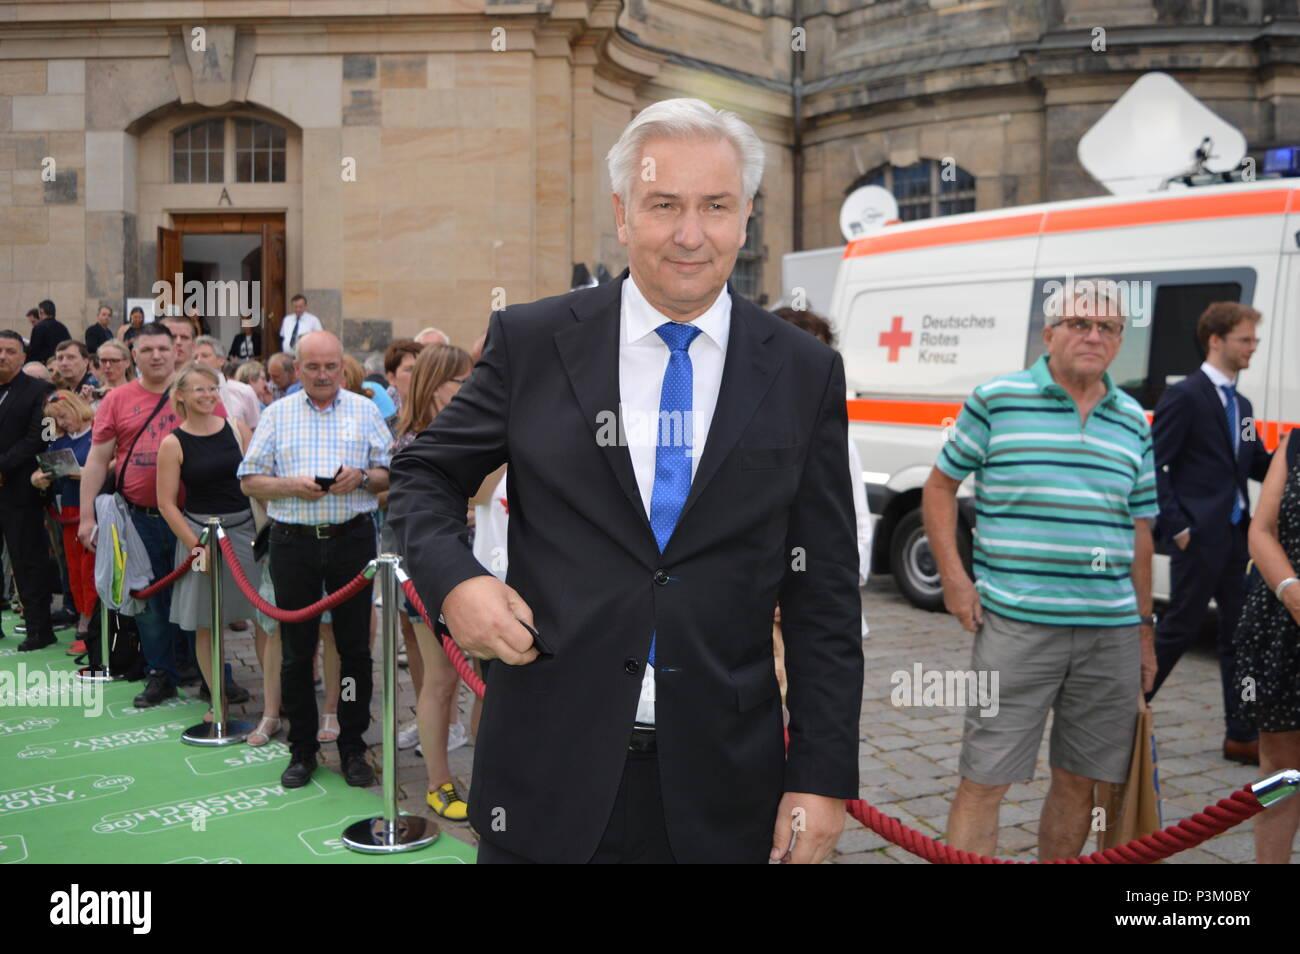 DRESDEN, GERMANY - JUNE 08: Klaus Wowereit during the Lambertz reception Stock Photo